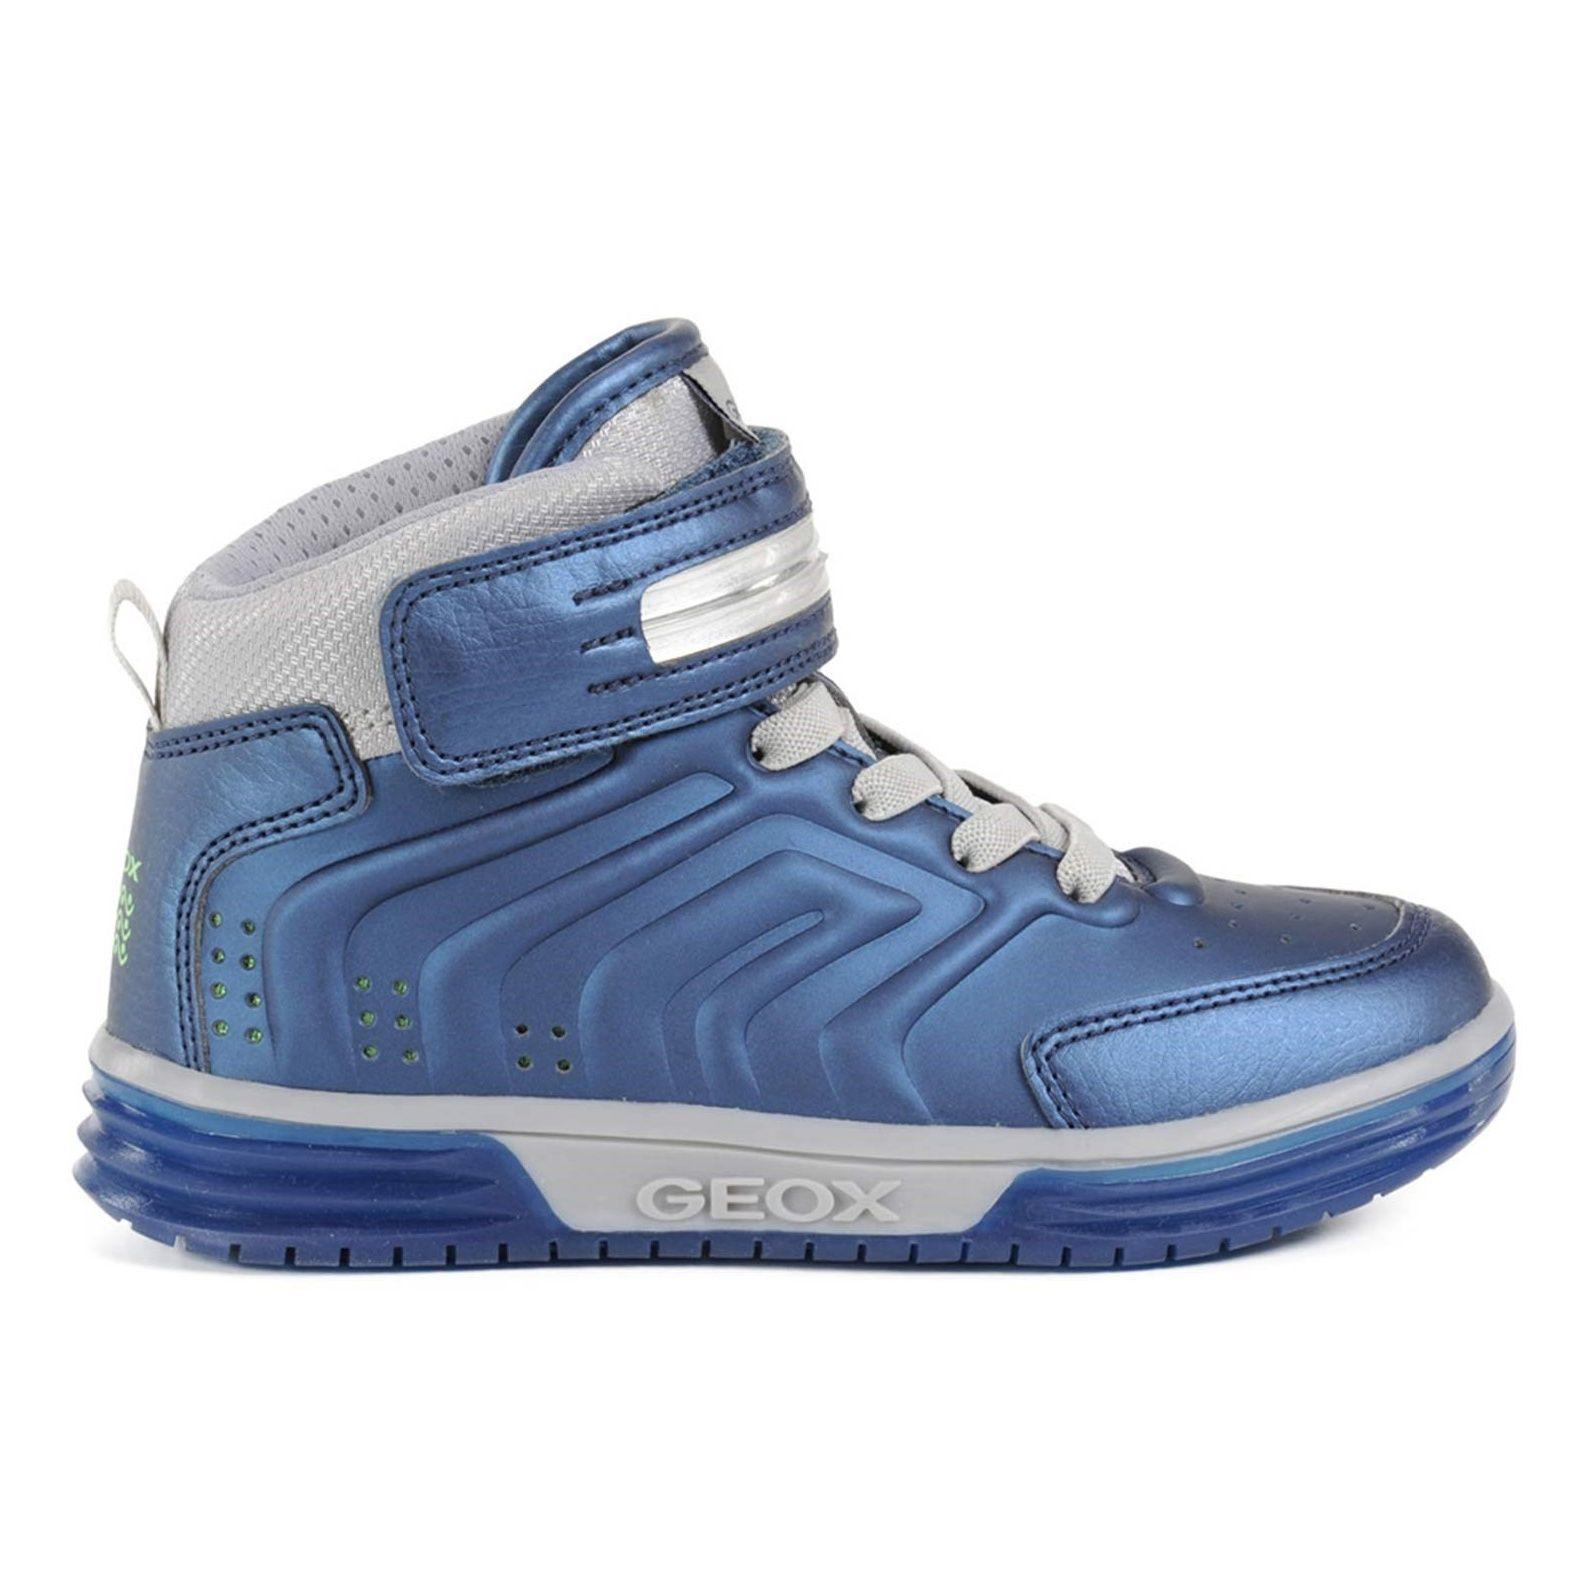 کفش ورزشی پسرانه Argonat - جی اوکس - آبي - 1